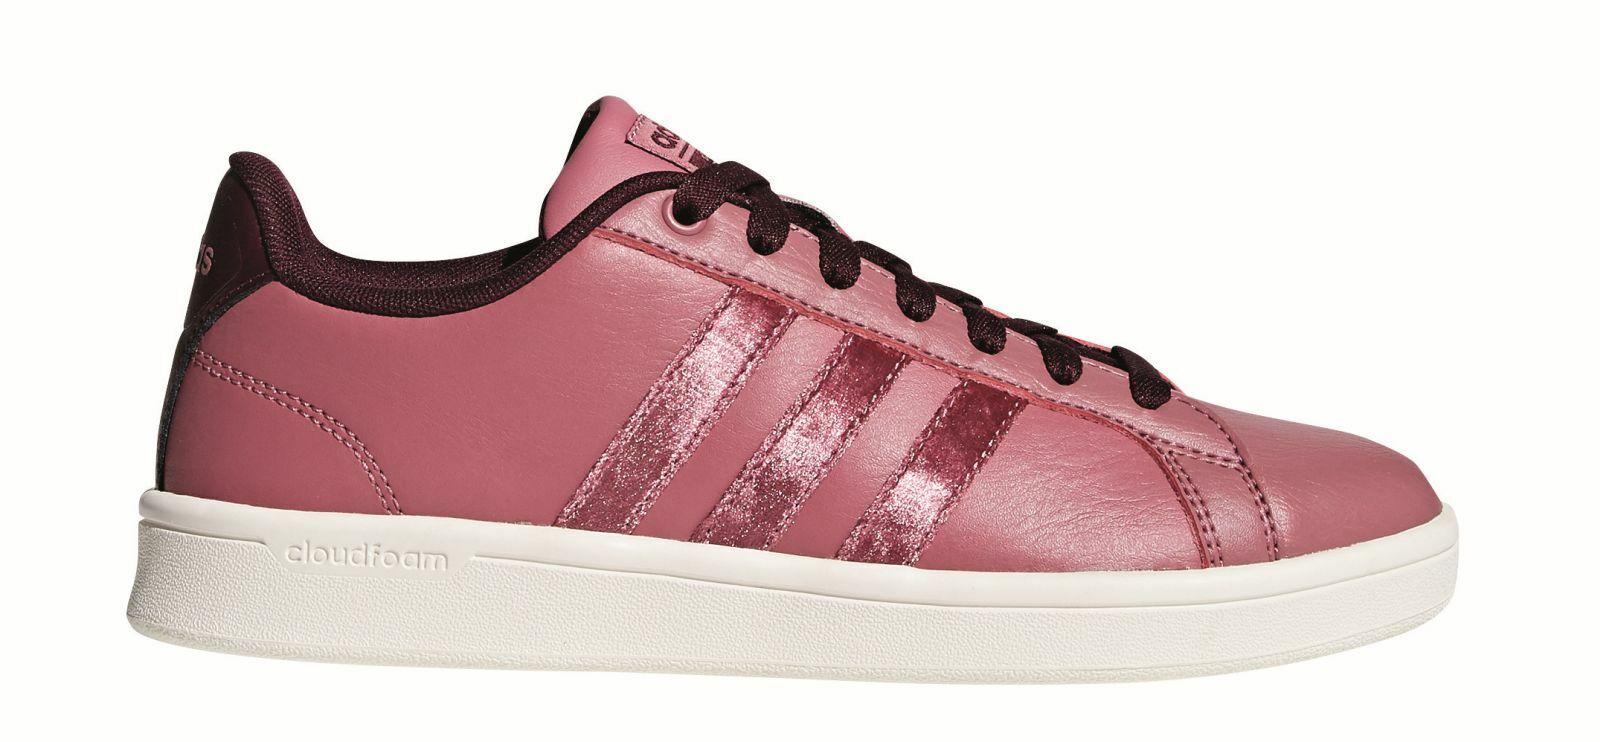 Adidas Core Woman Sneaker shoes Leisure CF Advantage w Trace Brown